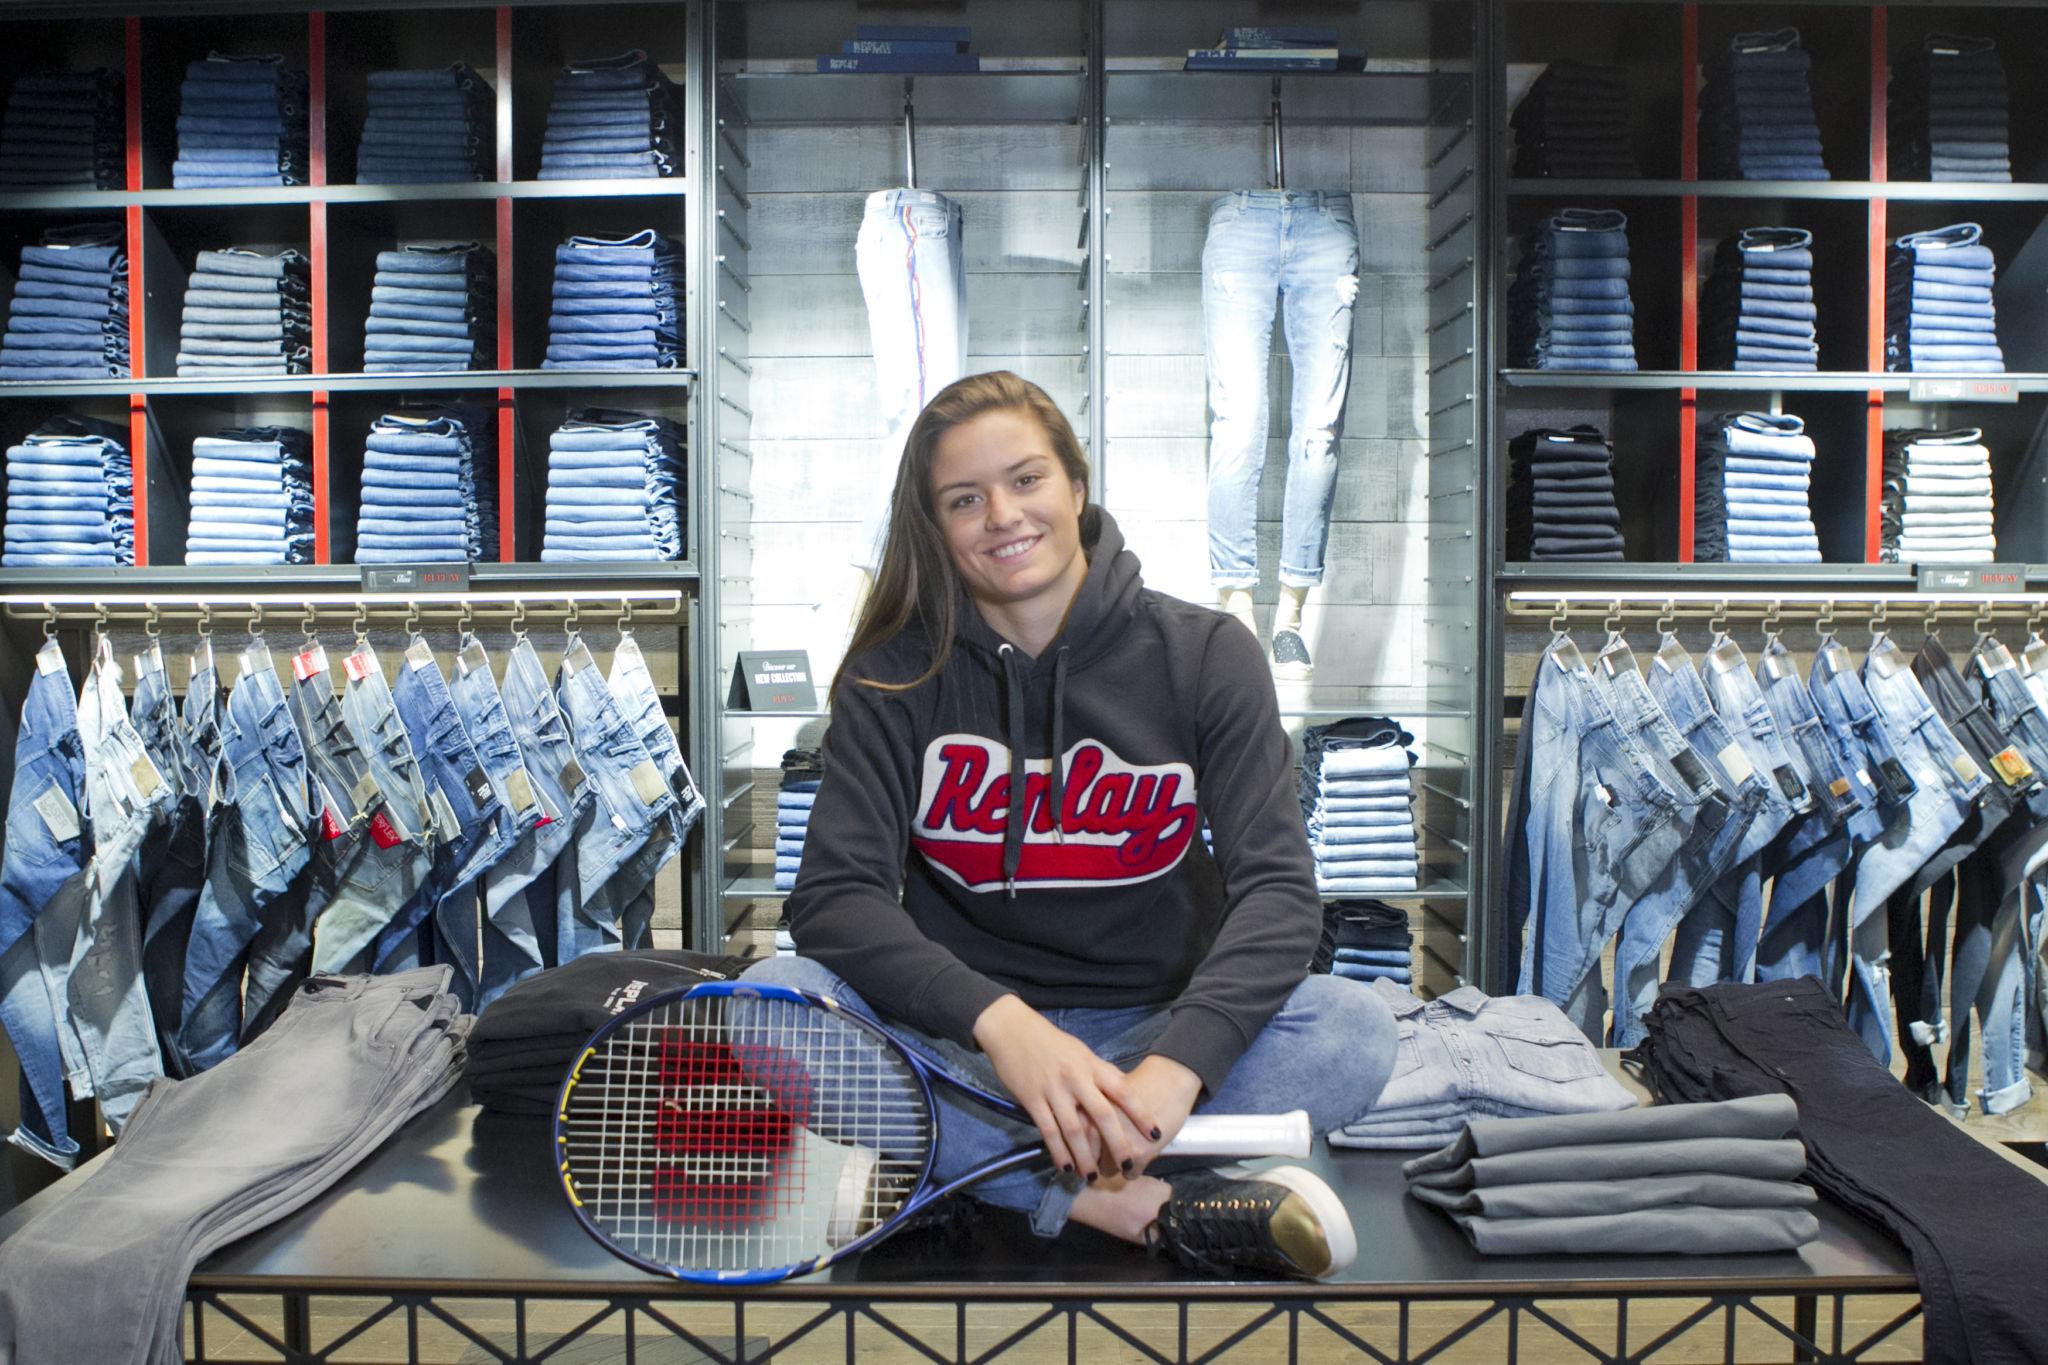 Tennis Player Maria Sakkari becomes the new REPLAY brand ambassador.